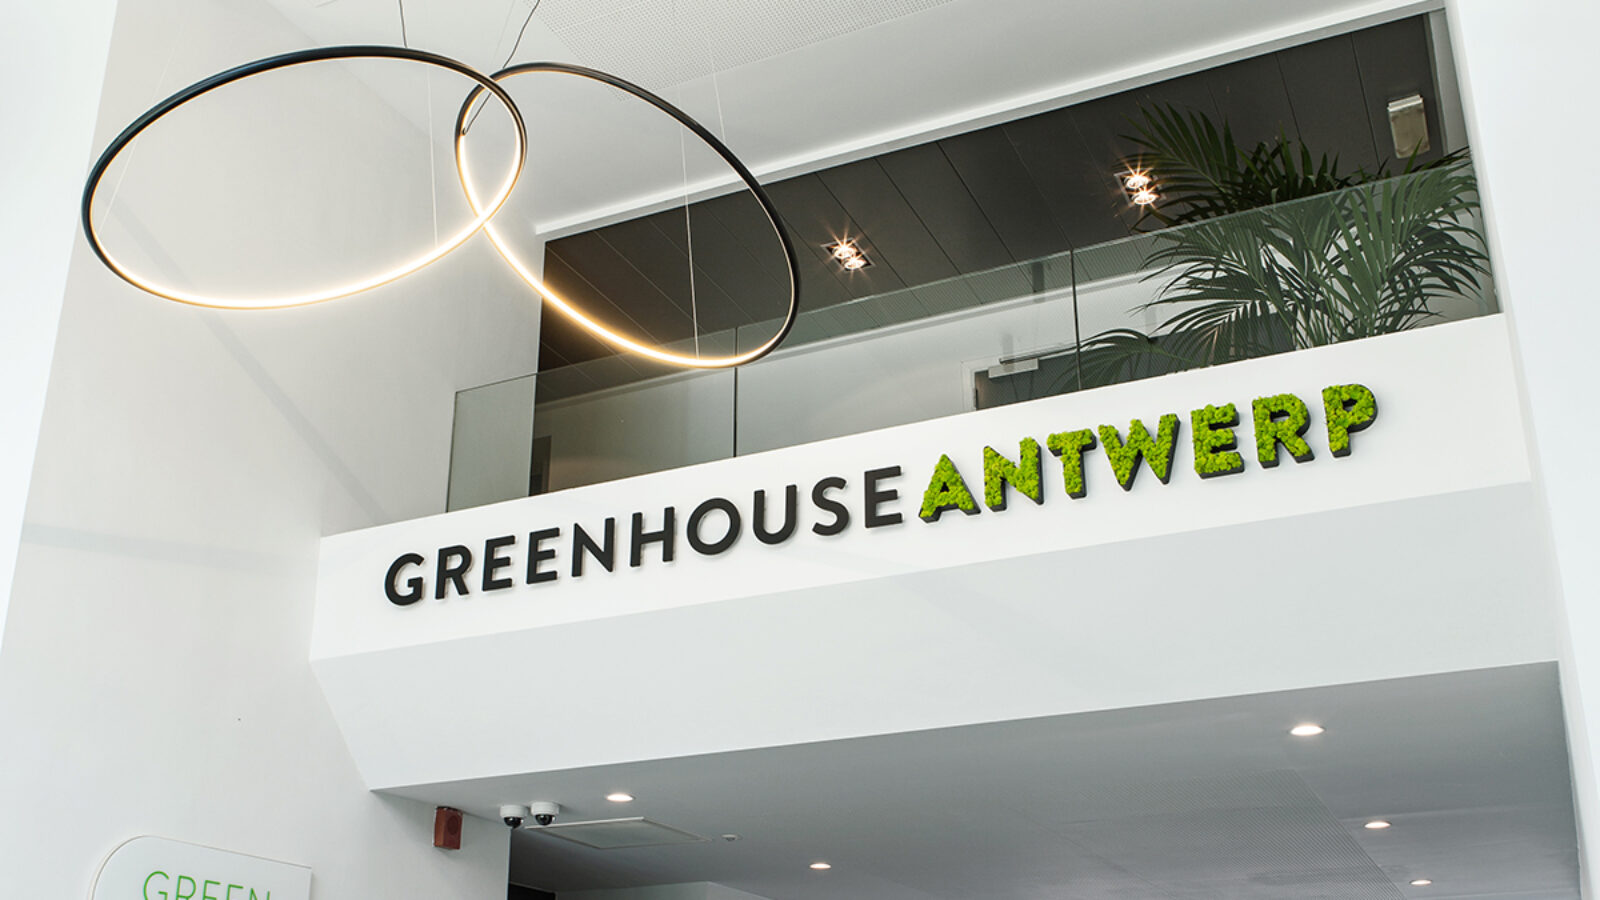 Greenhouse Antwerp hal